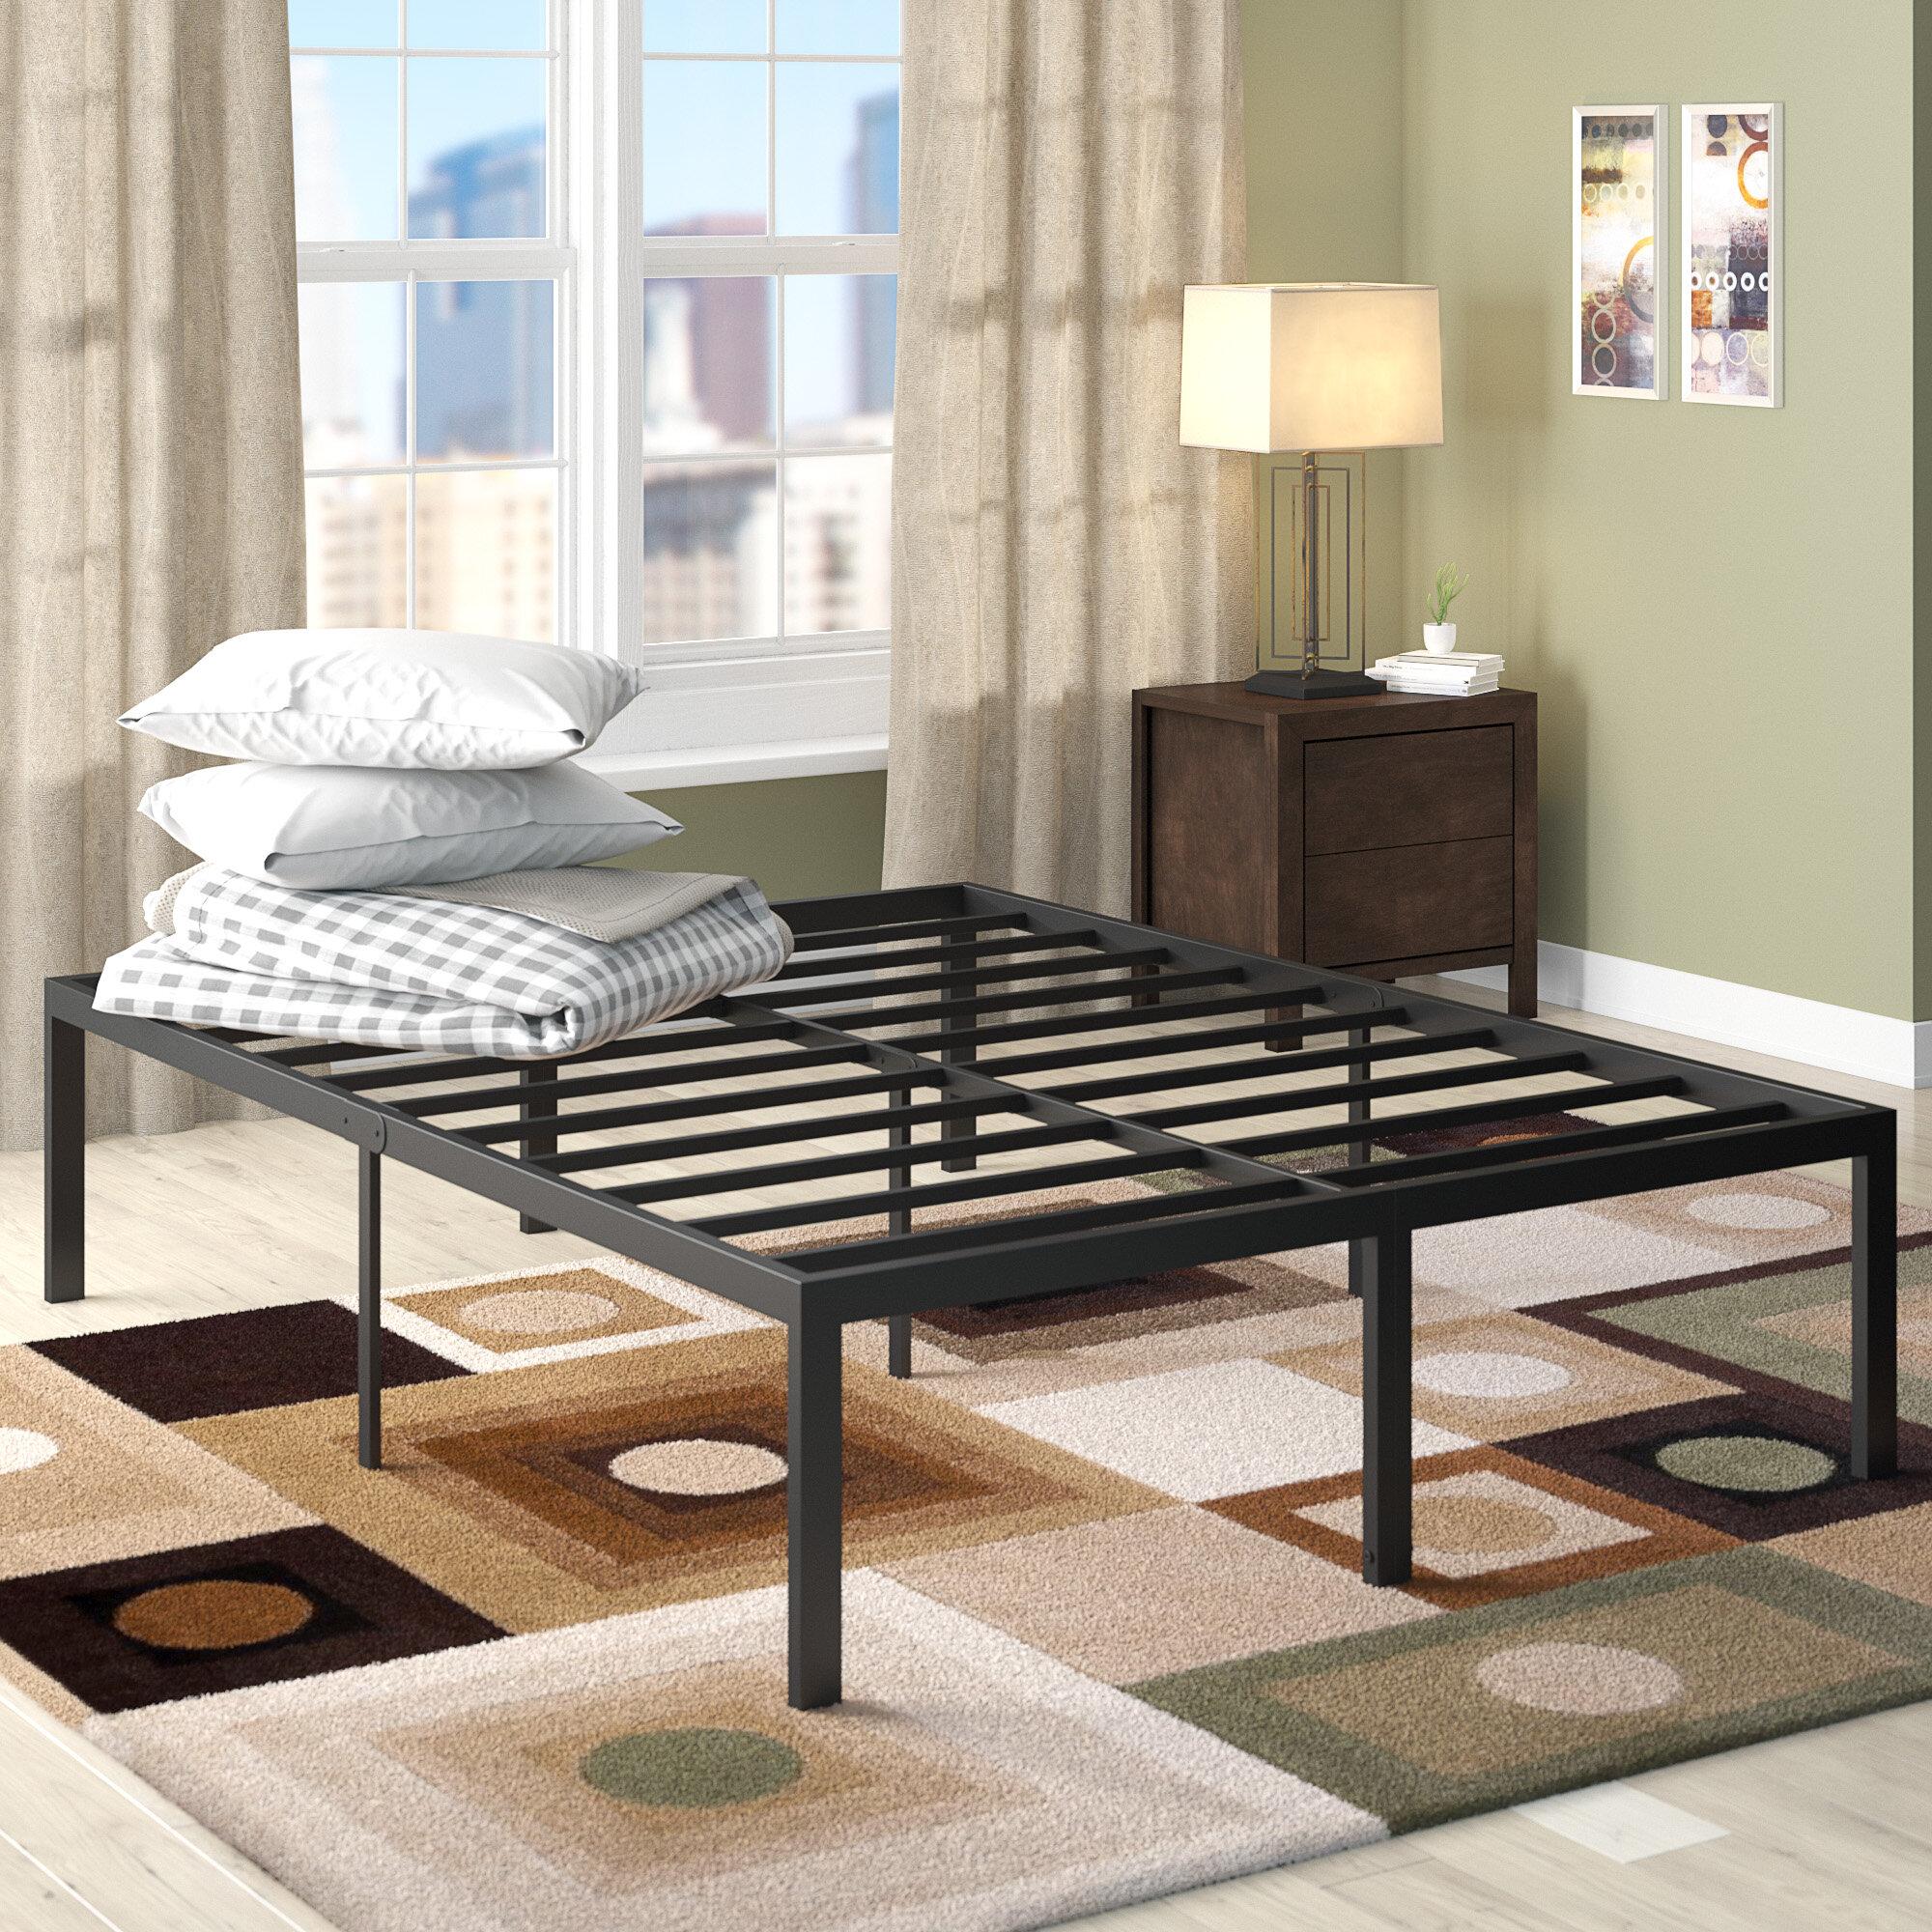 Latitude Run Yetter Steel Slat Bed Frame U0026 Reviews | Wayfair